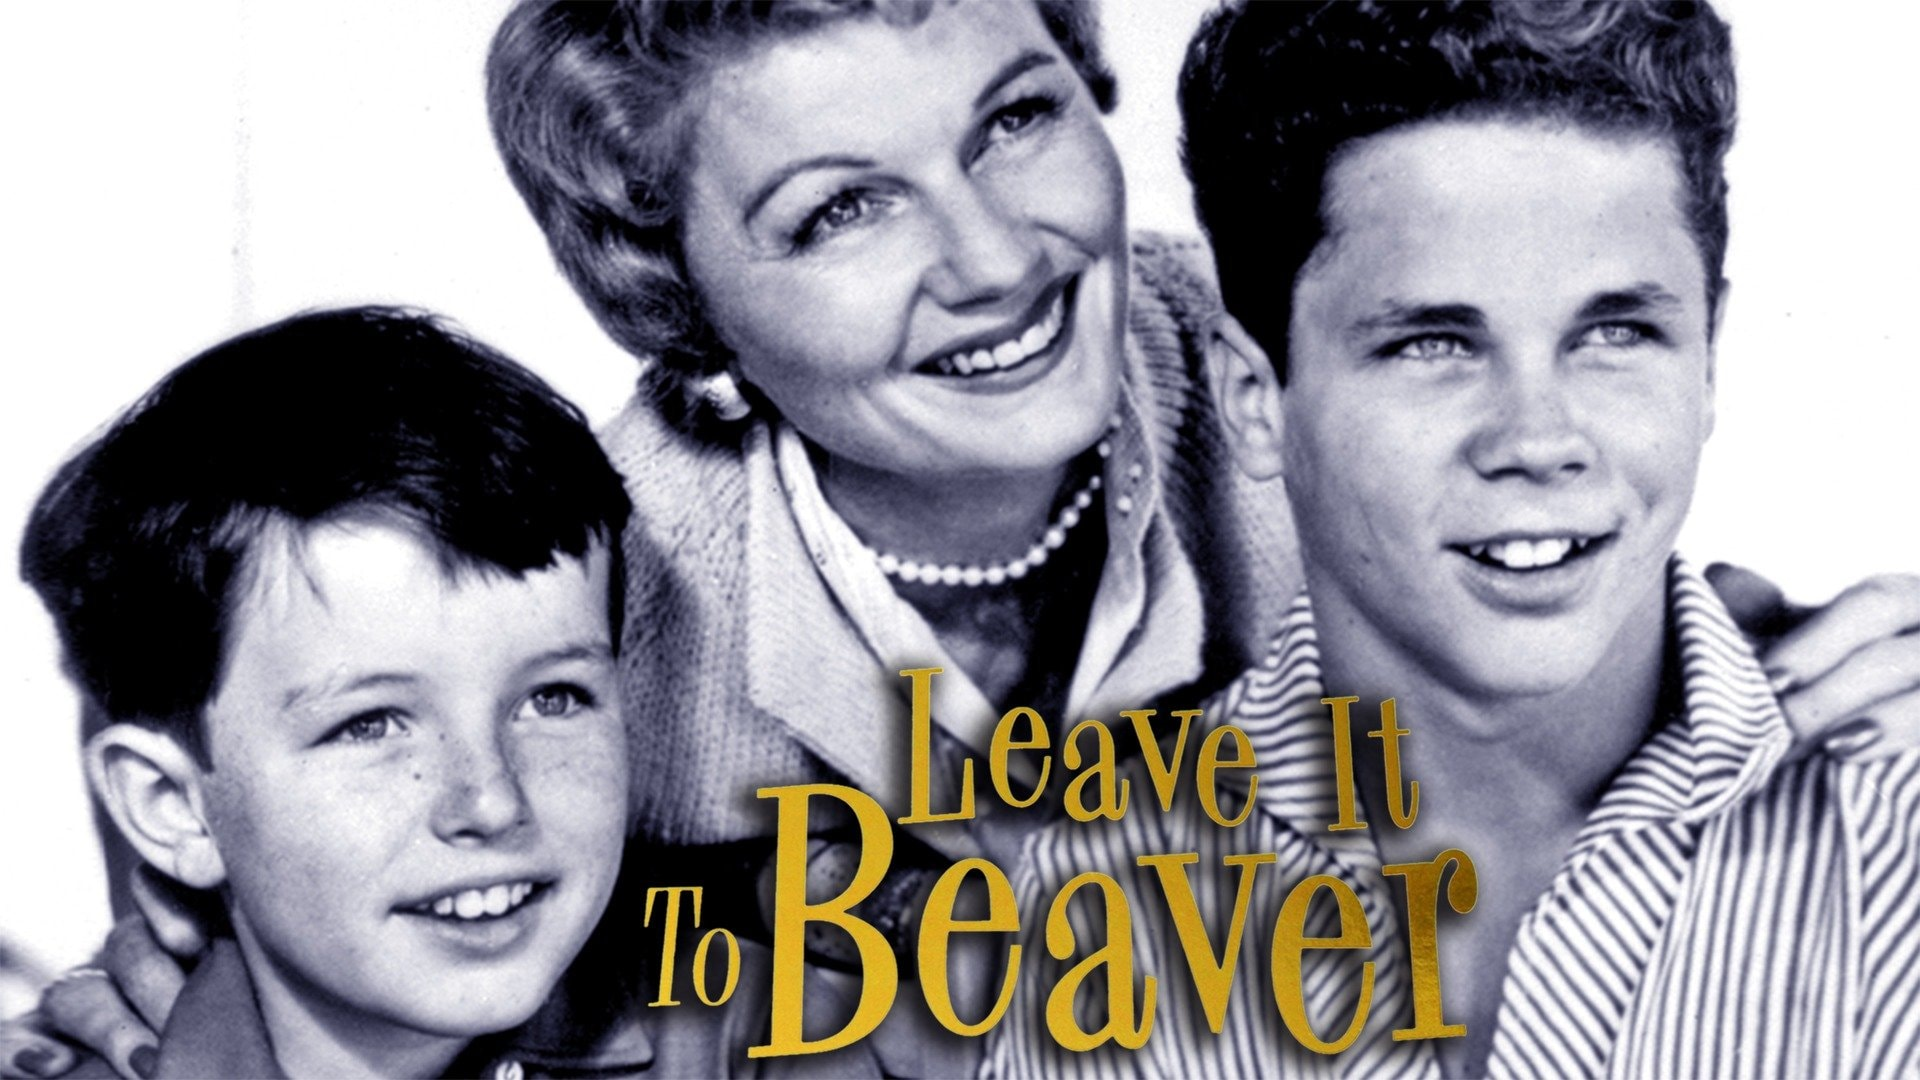 Beaver's Tonsils